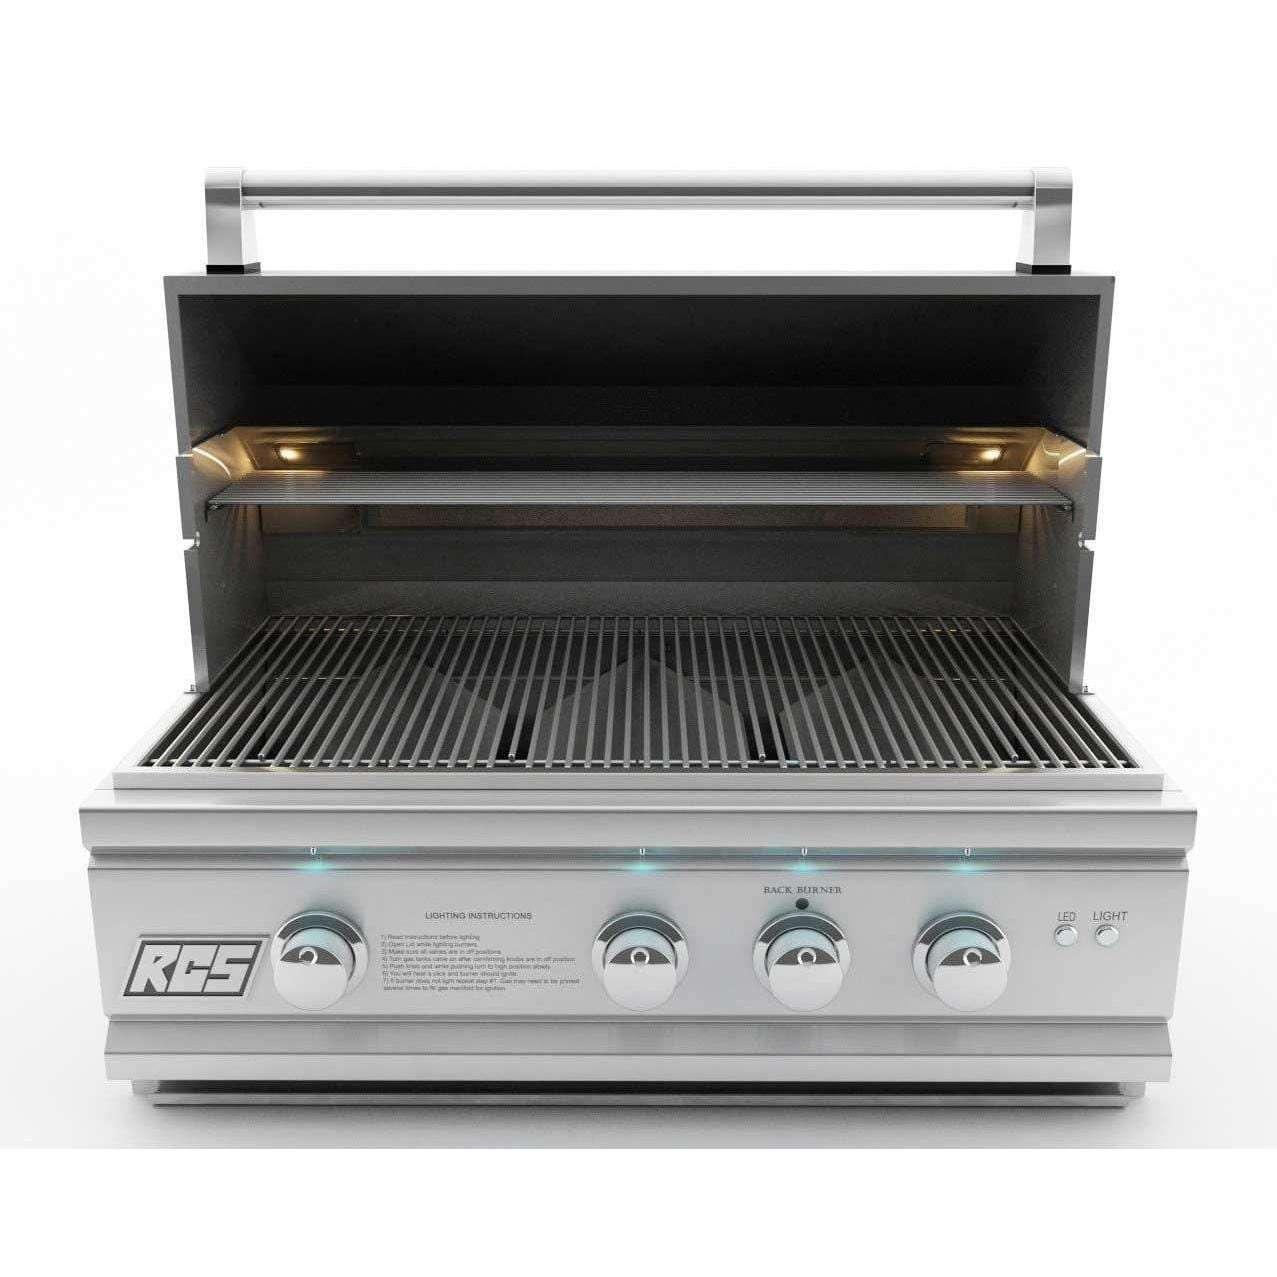 RCS Cutlass Pro 30-Inch Propane Gas Grill